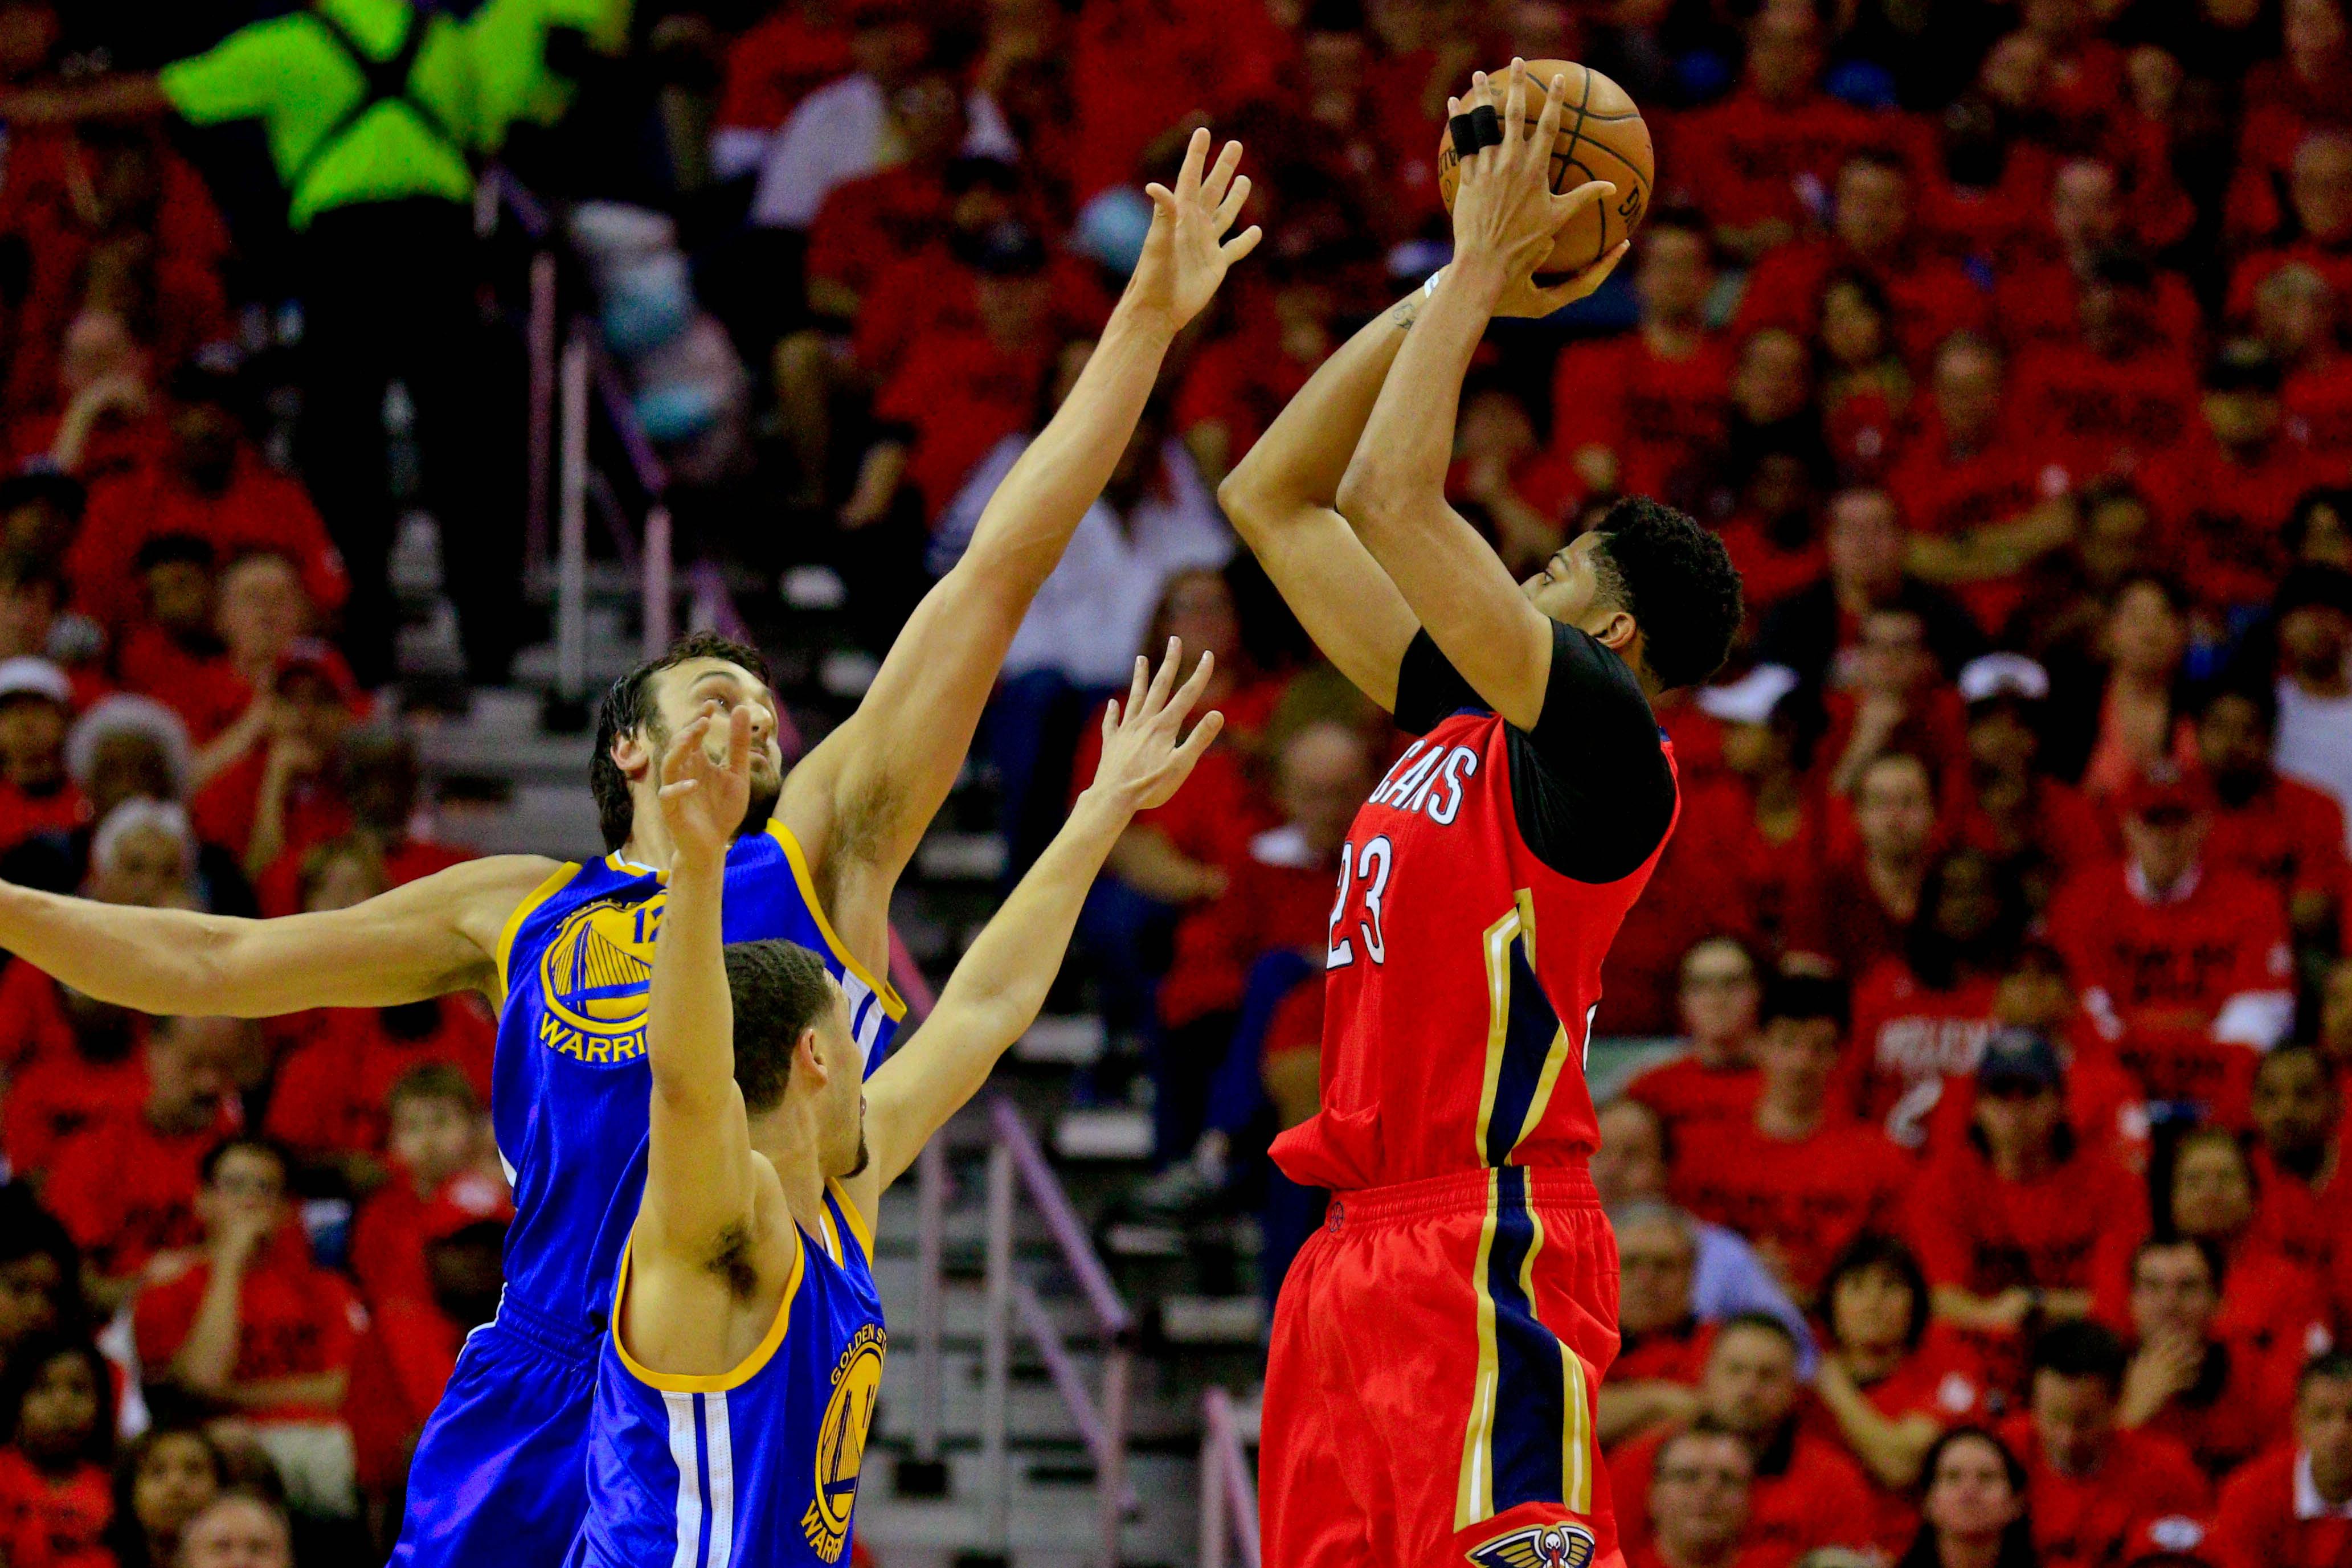 Davis rises over two GS defenders on a midrange shot.